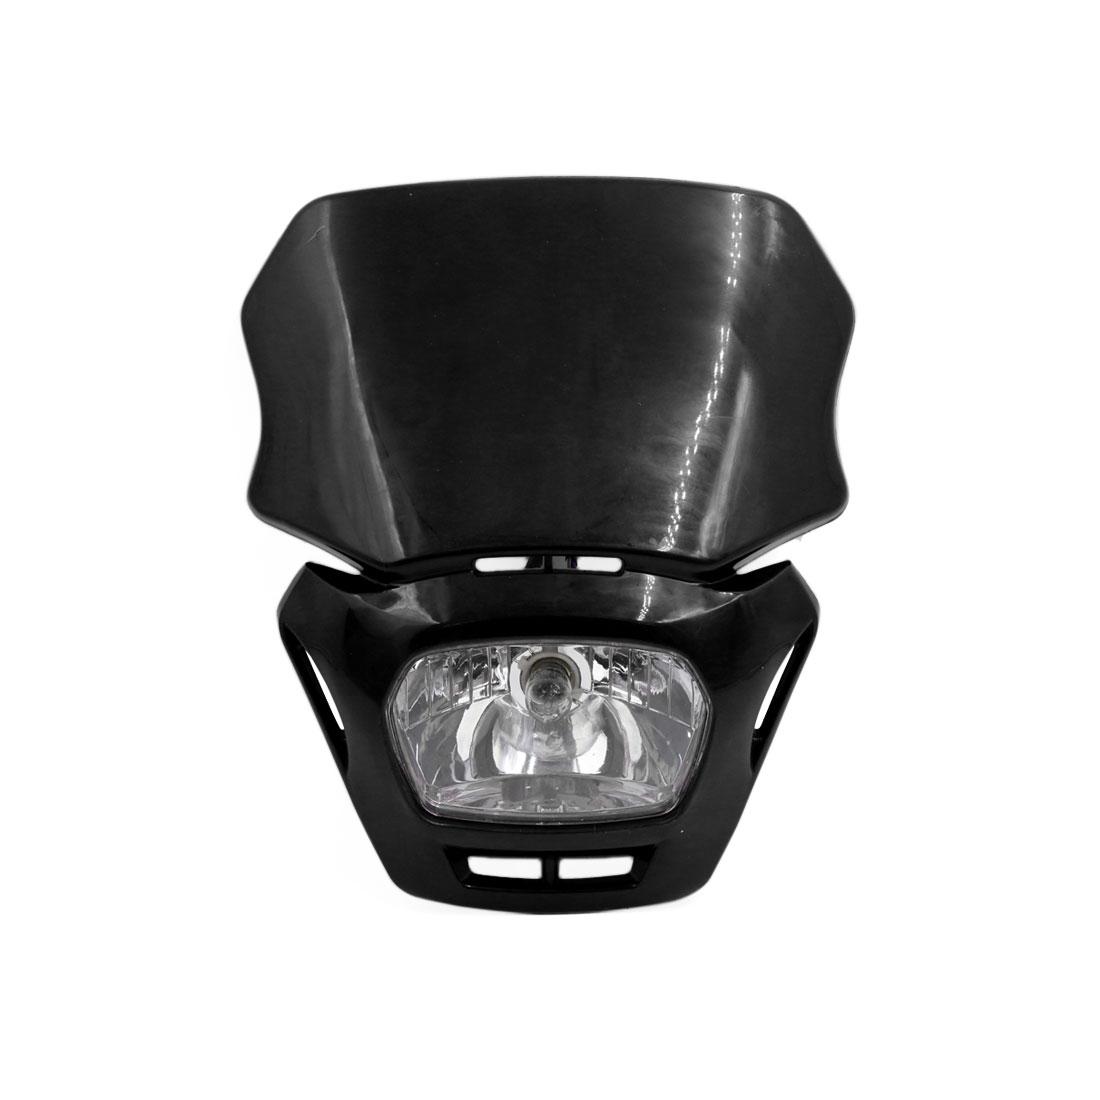 Black Shell Motorcycle Street Fighter Front Headlight Fairing Lamp Light Yellow